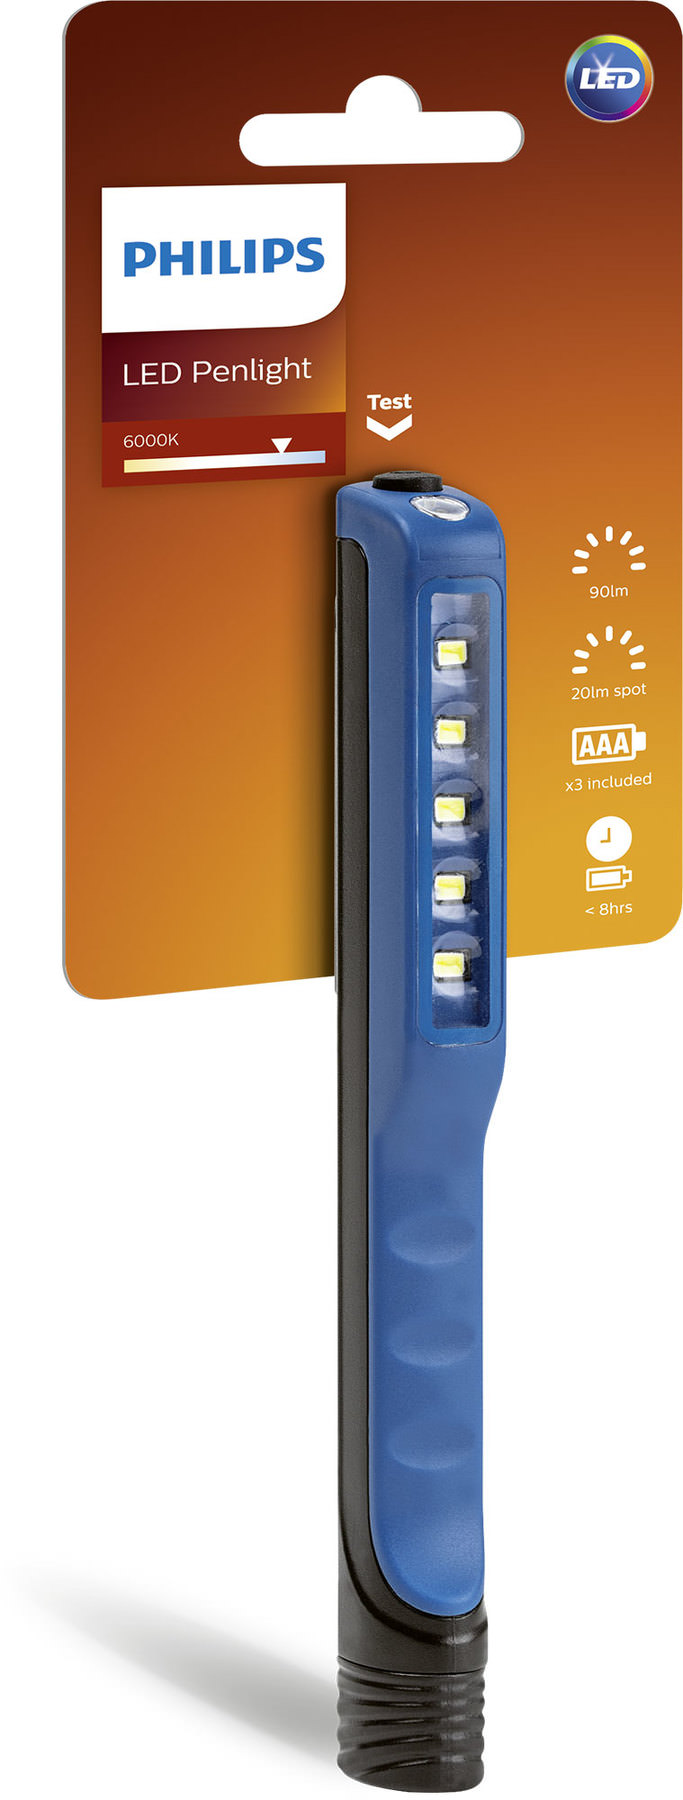 Philips LED Inspektions Lampe Test | Juli 2020